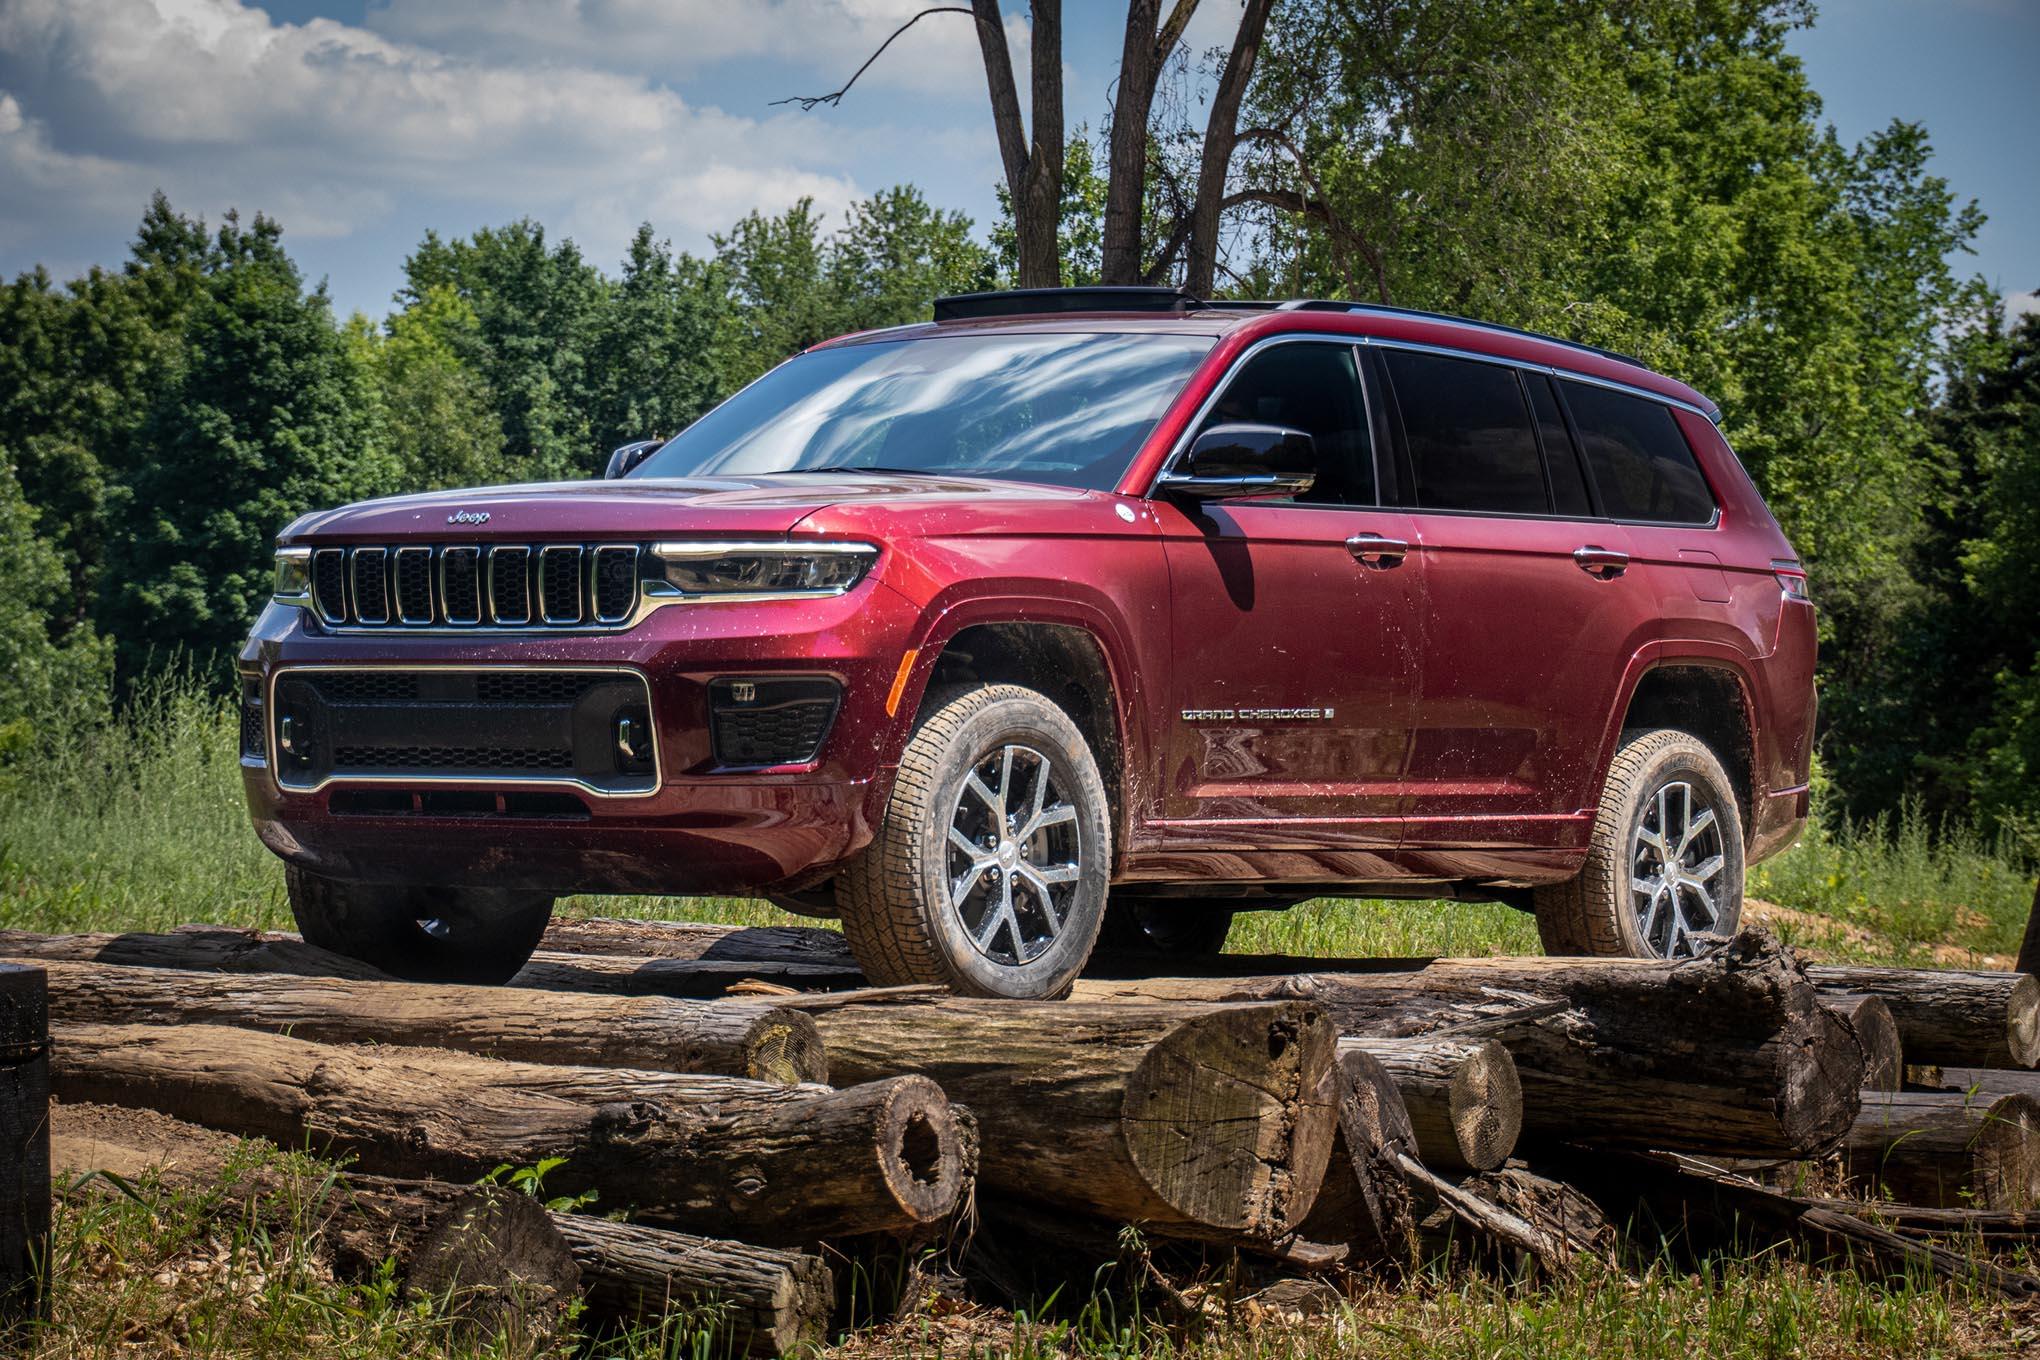 2021 Jeep Grand Cherokee L First Drive: A Worthy Successor